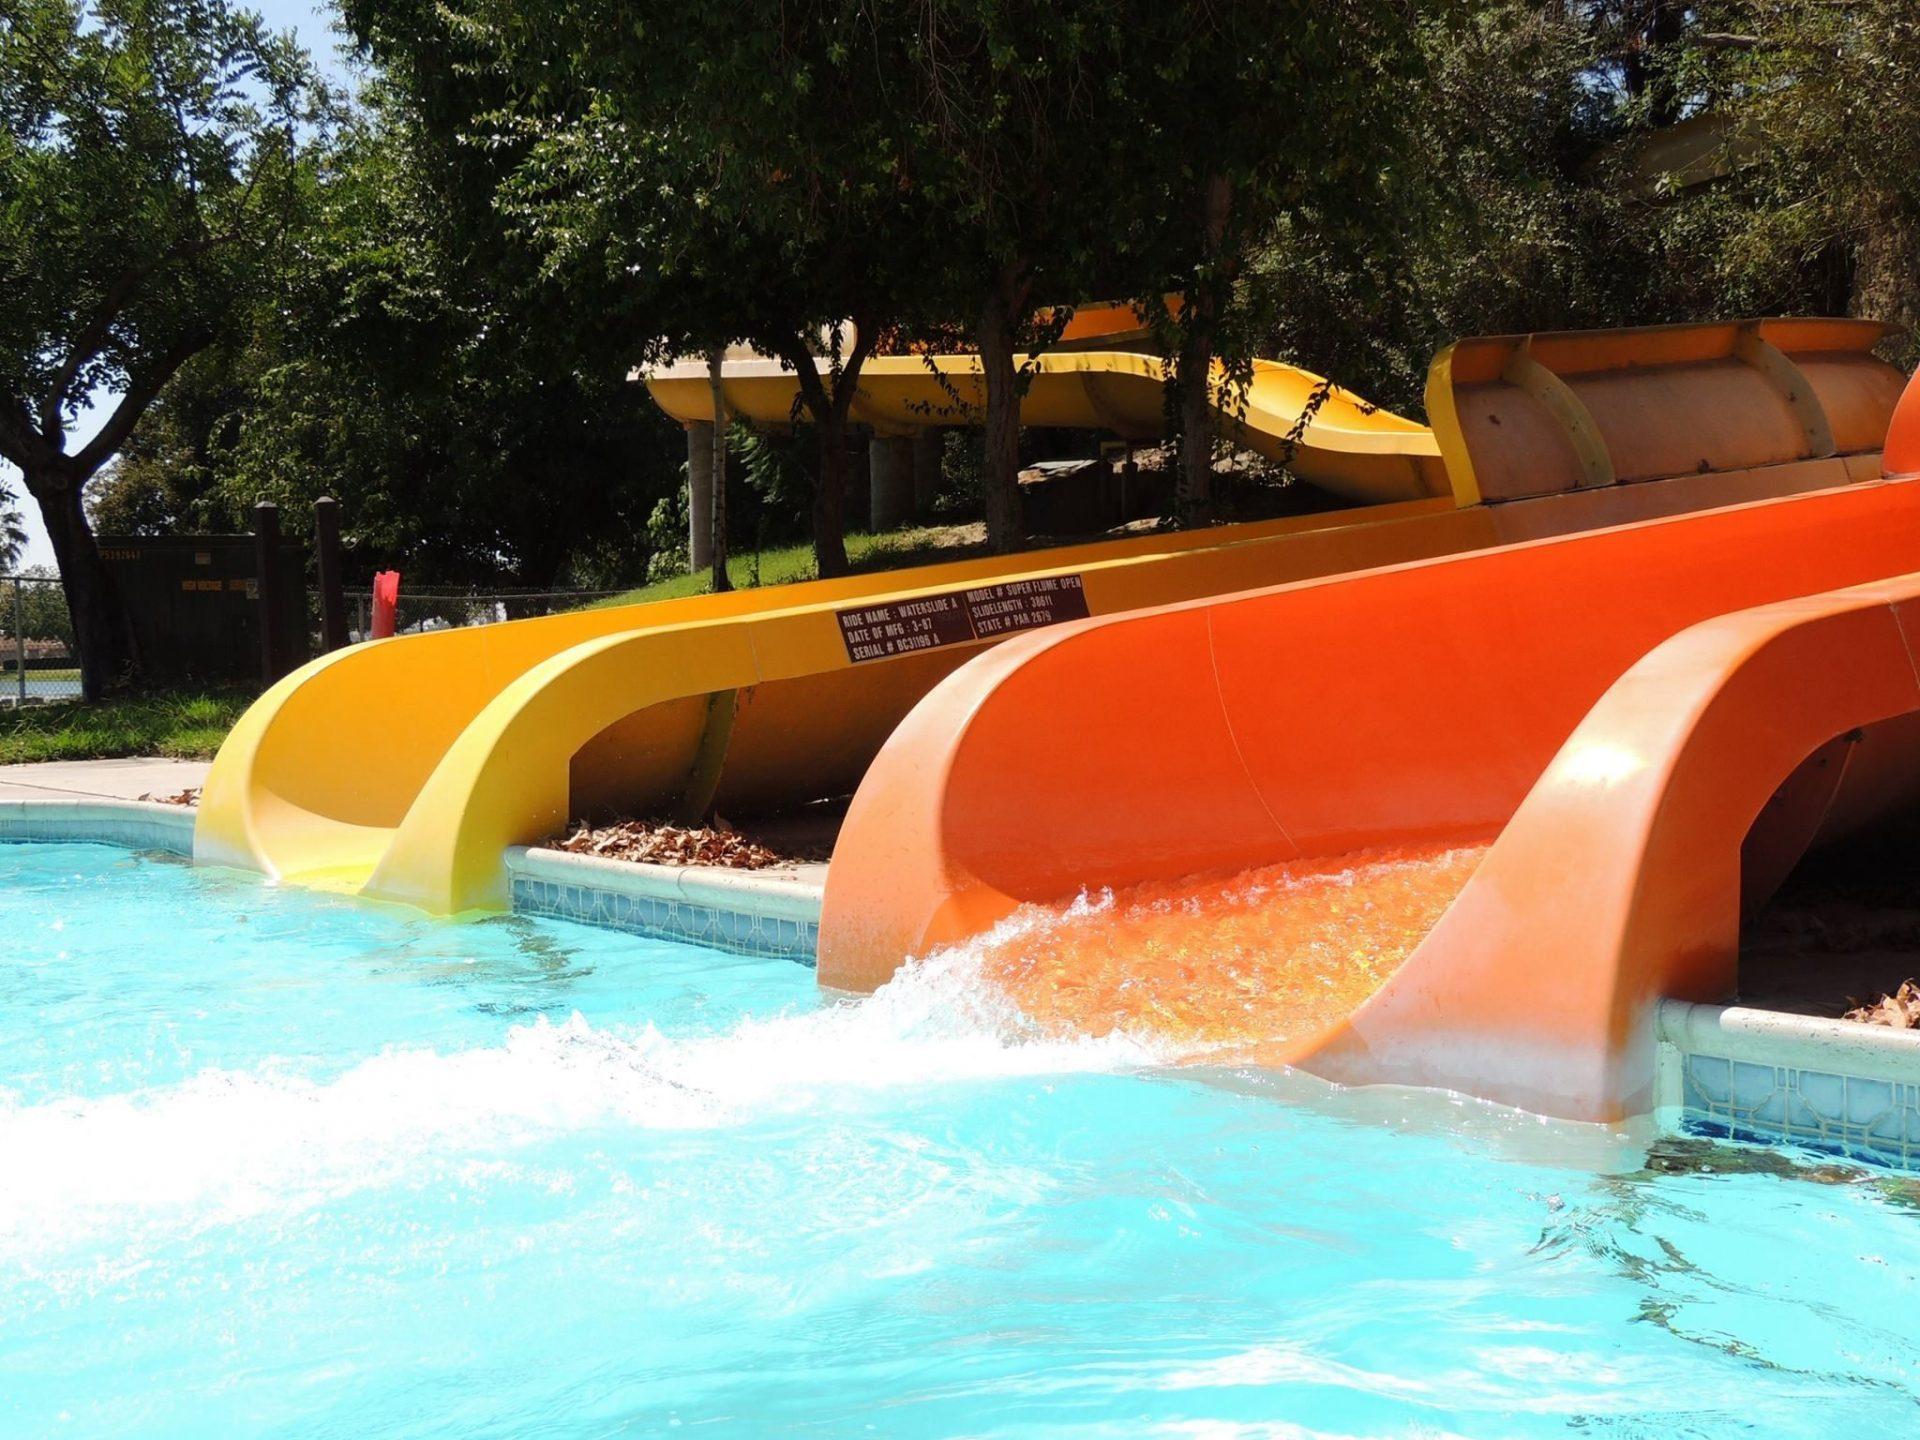 2 Water slides